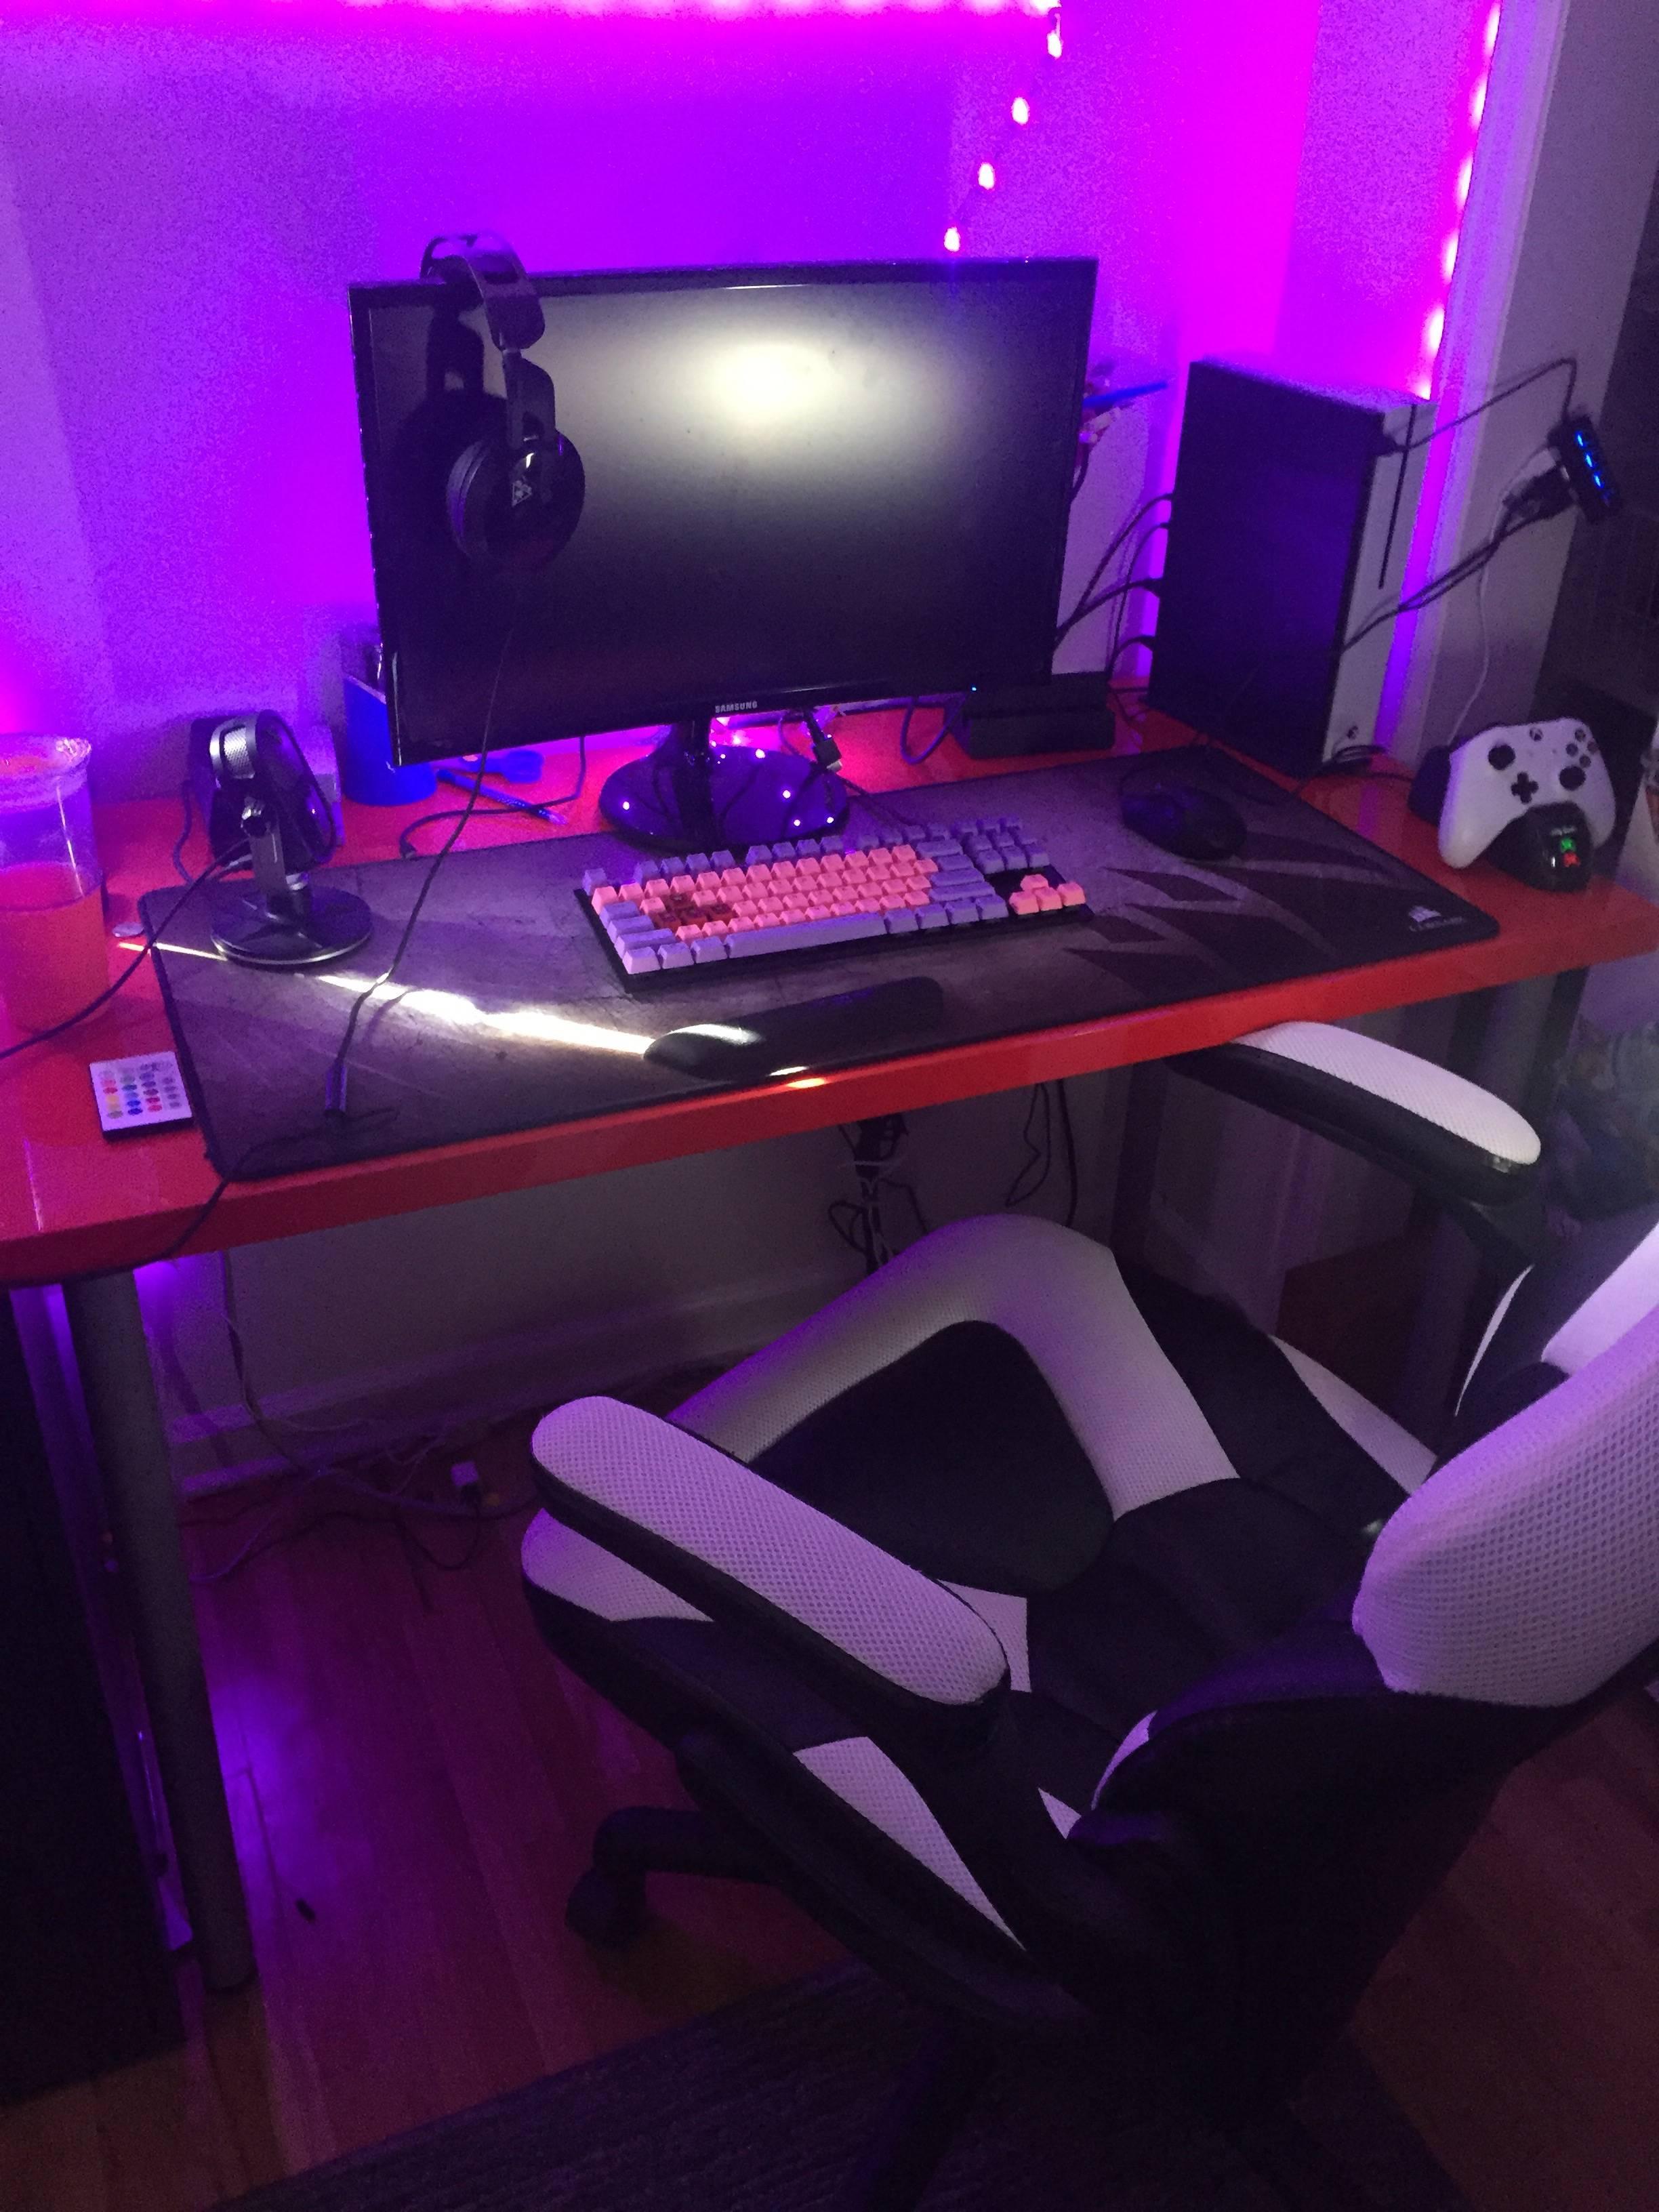 GamingSetupPro's Setup - Setup for gaming | Scooget